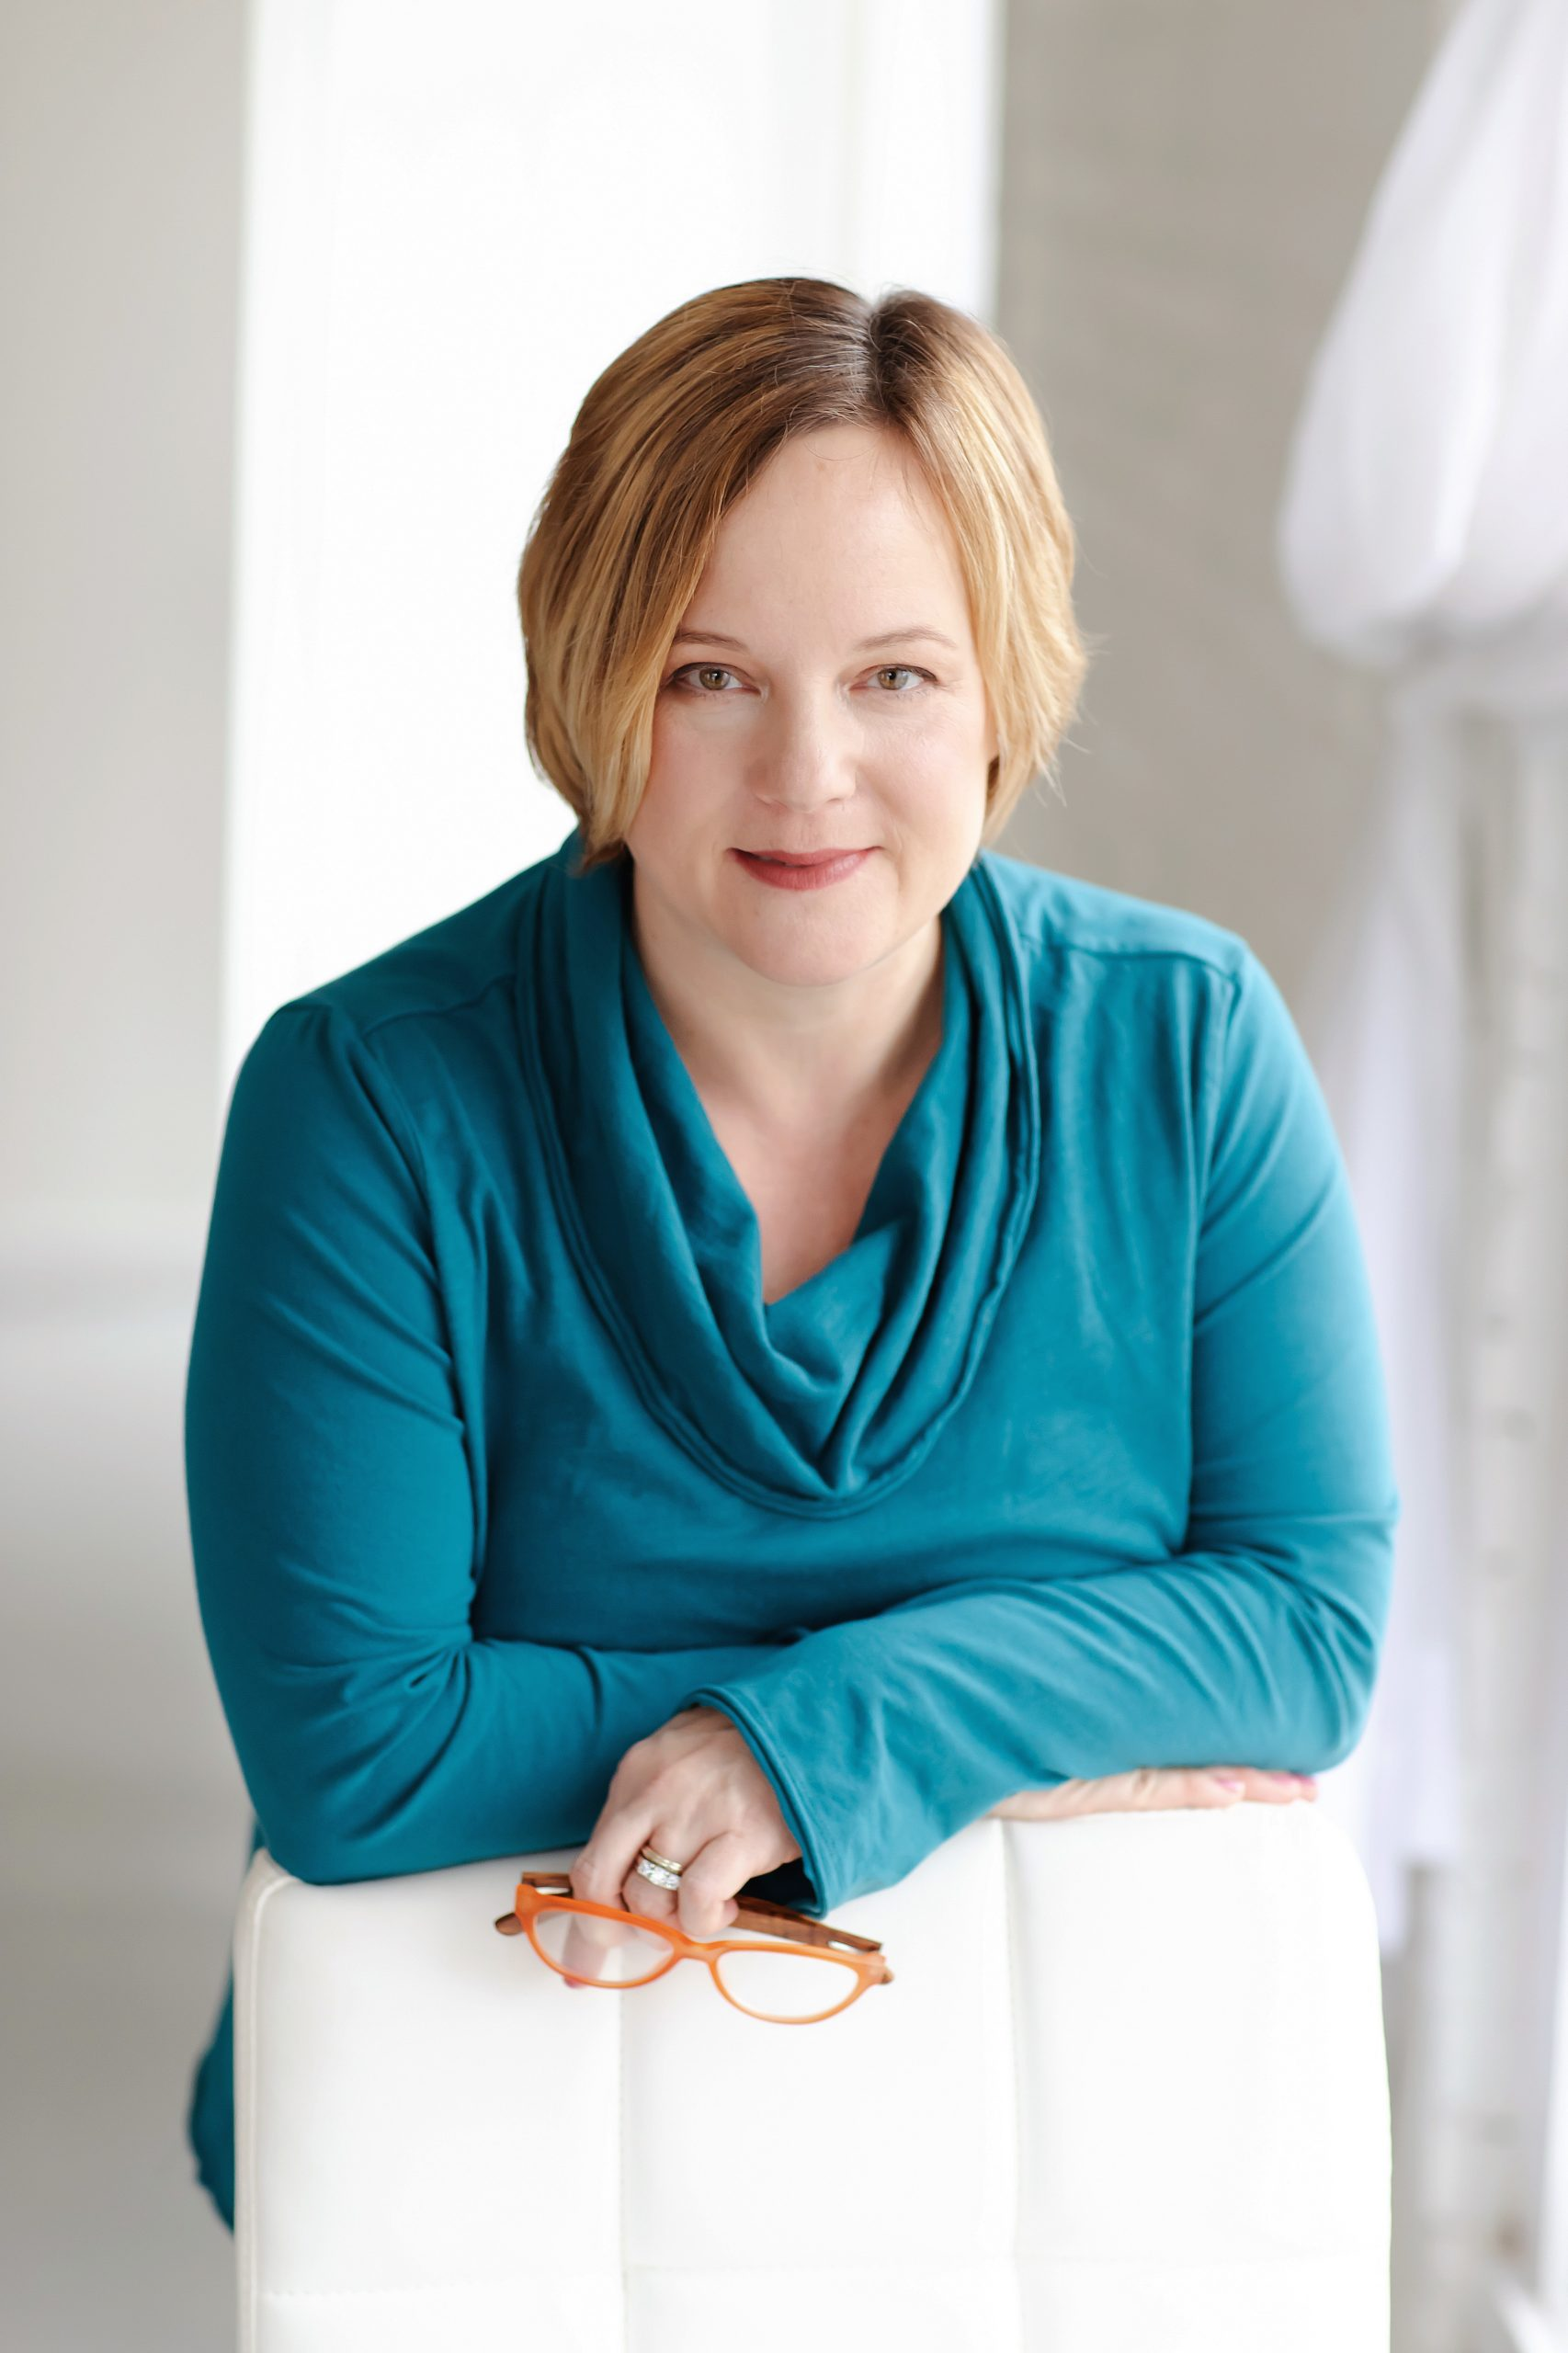 Sarah Warburton